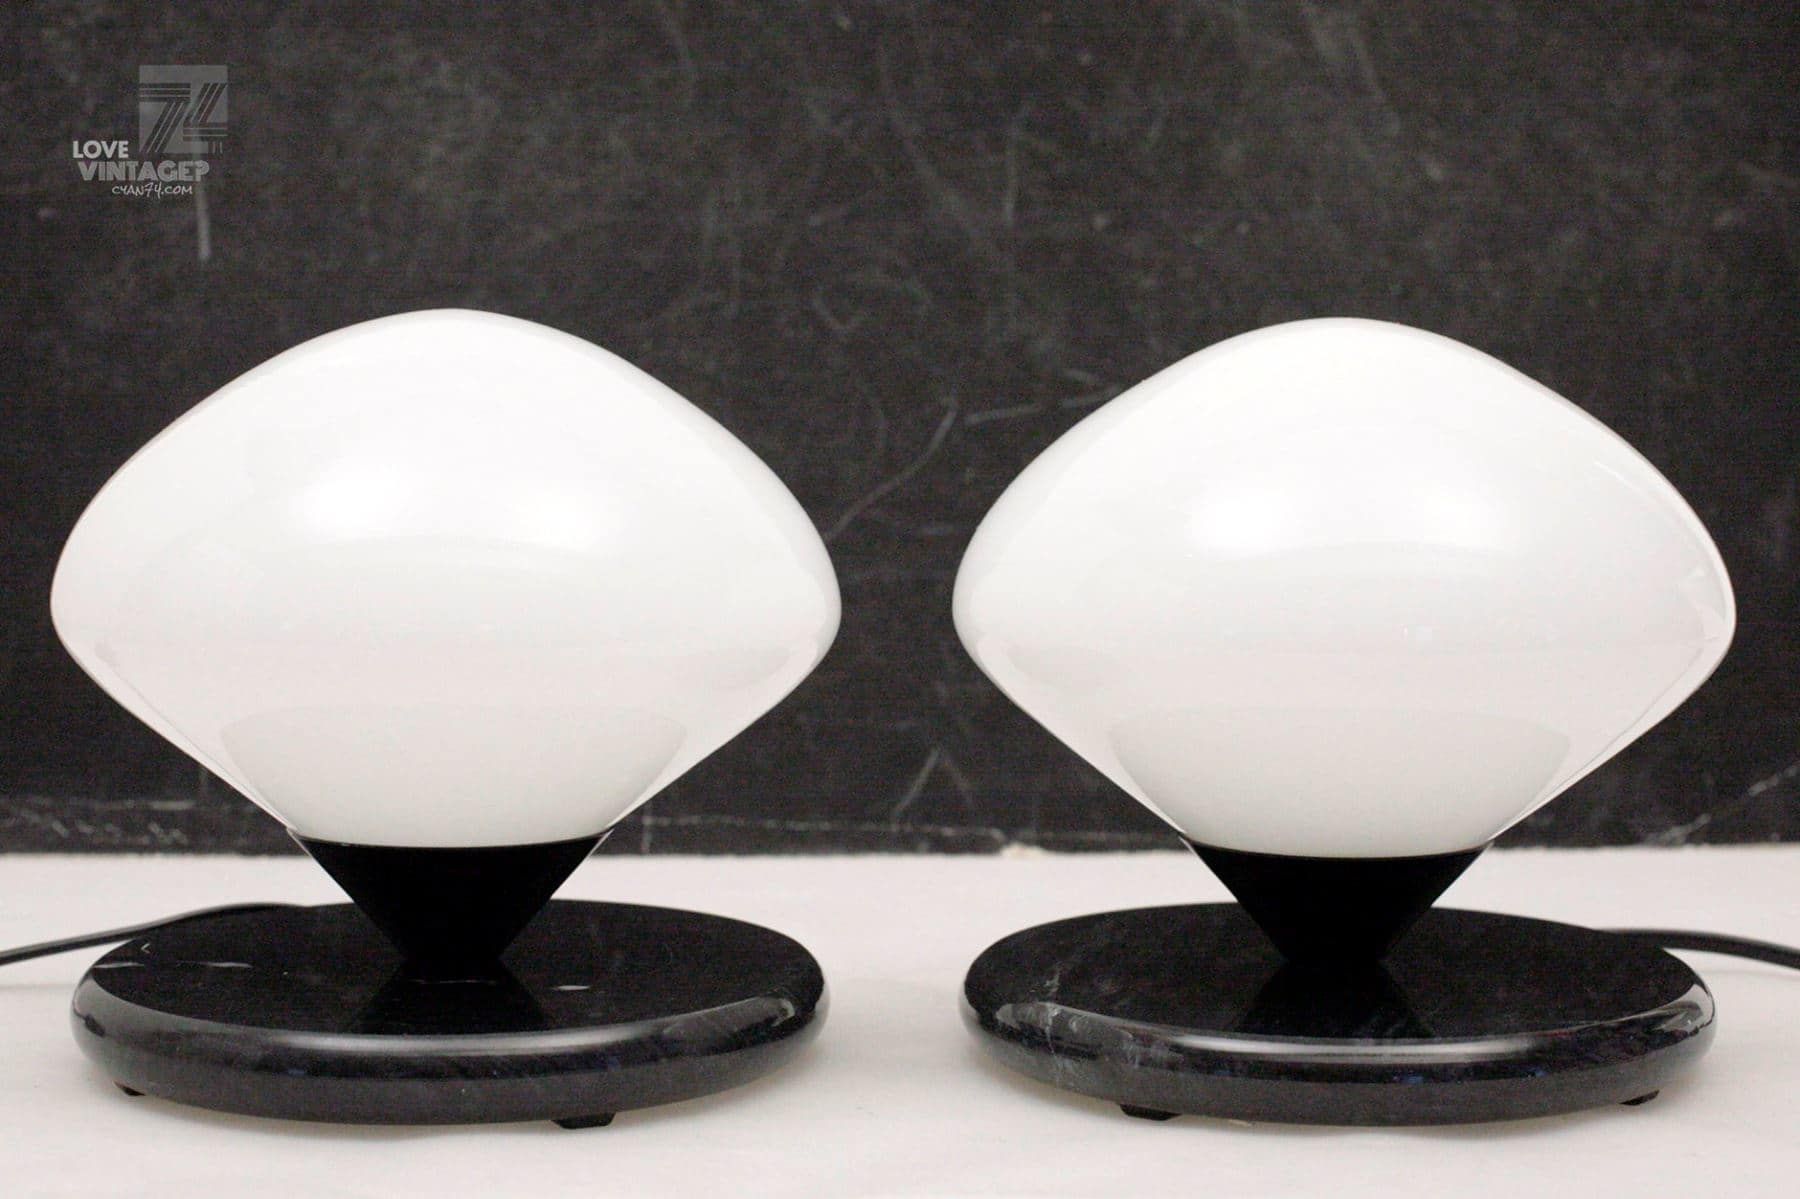 2x optelma oa 2 nachttischlampen 1970s cyan74com vintage and pop culture - Nachttischlampen